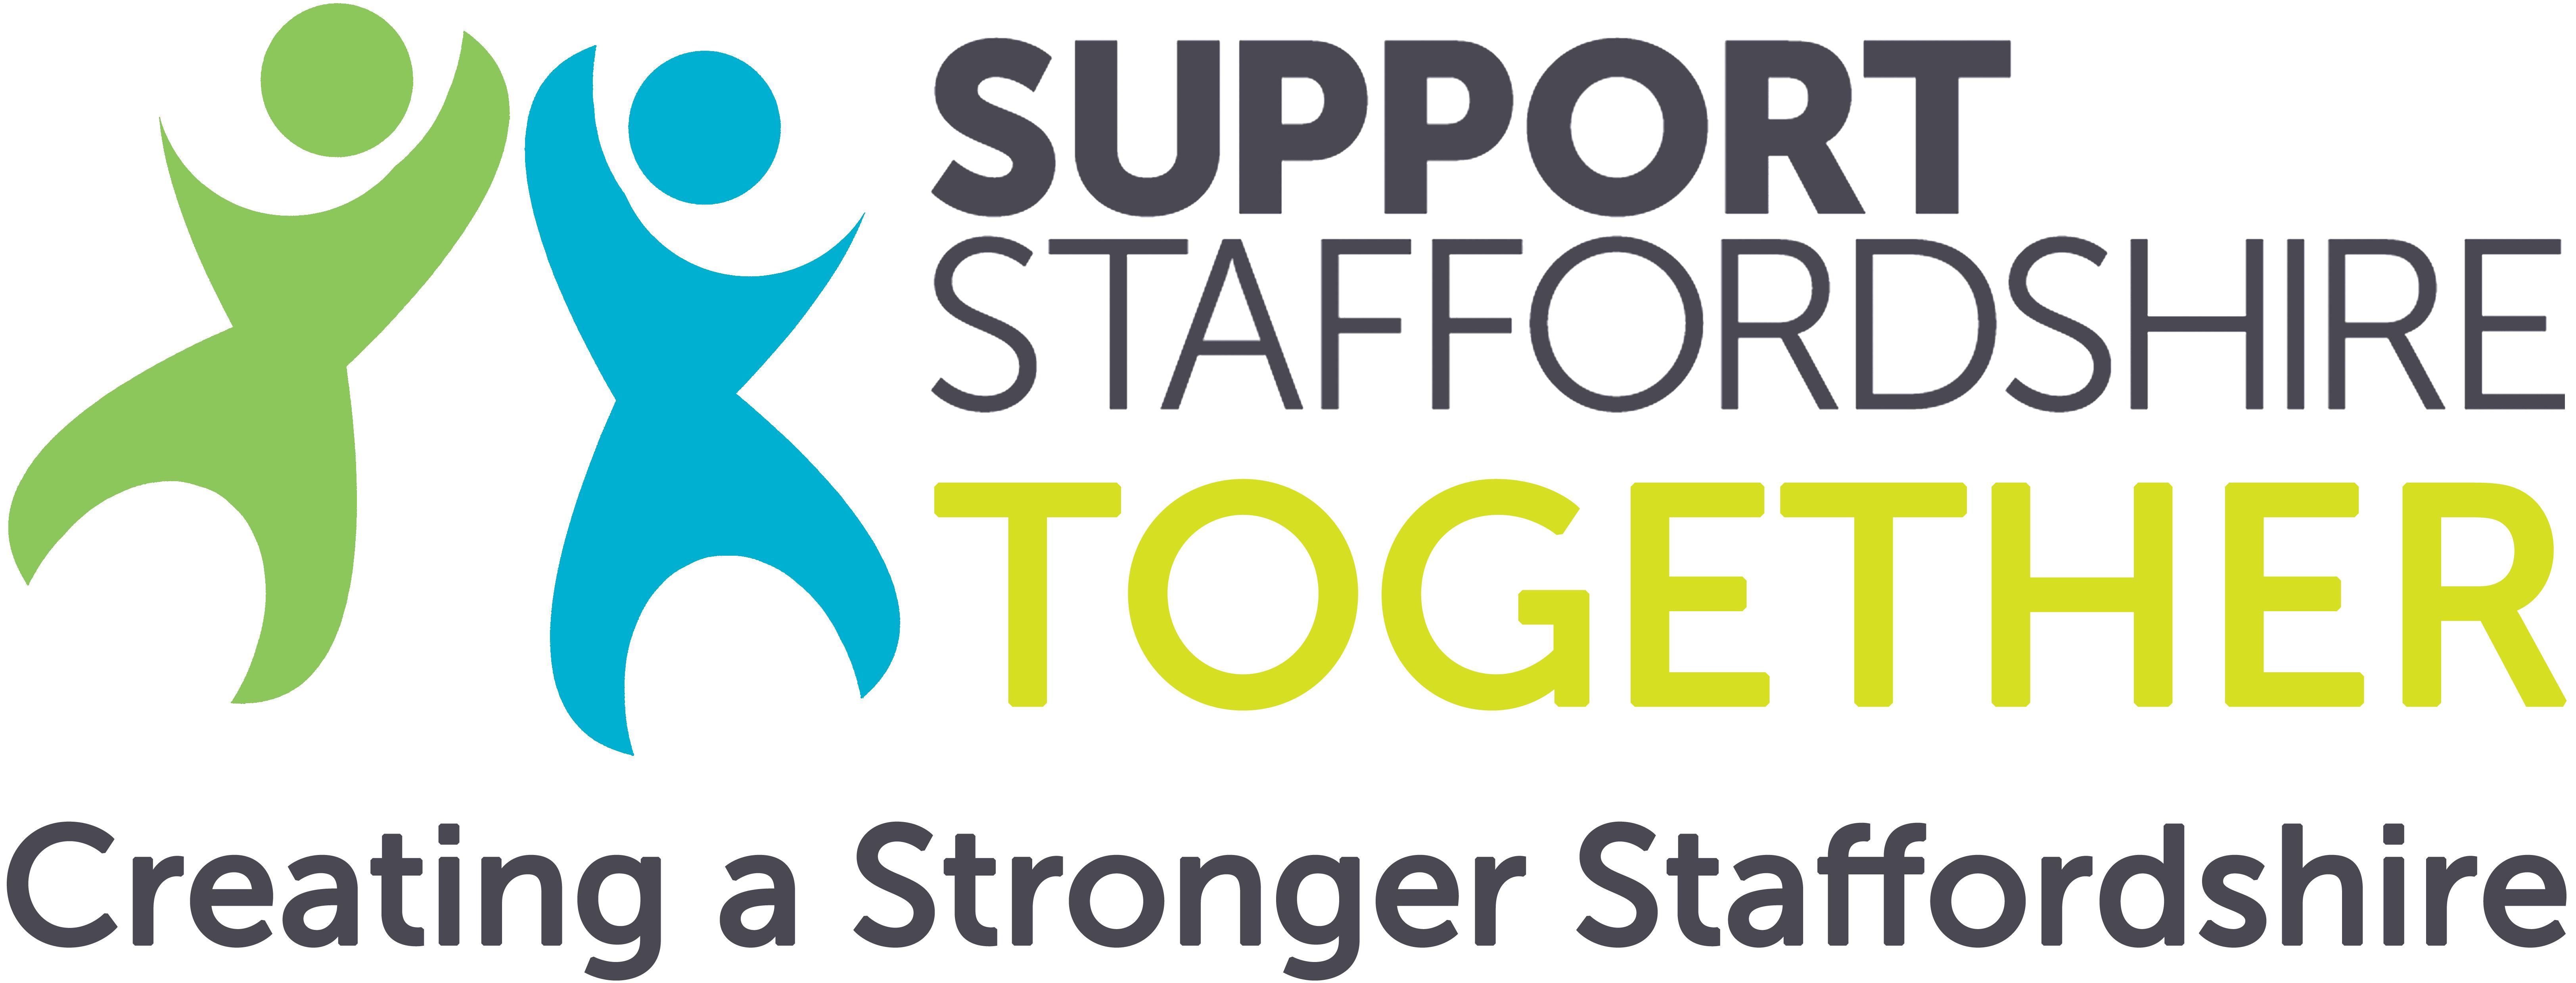 Support Staffordshire Together Logo